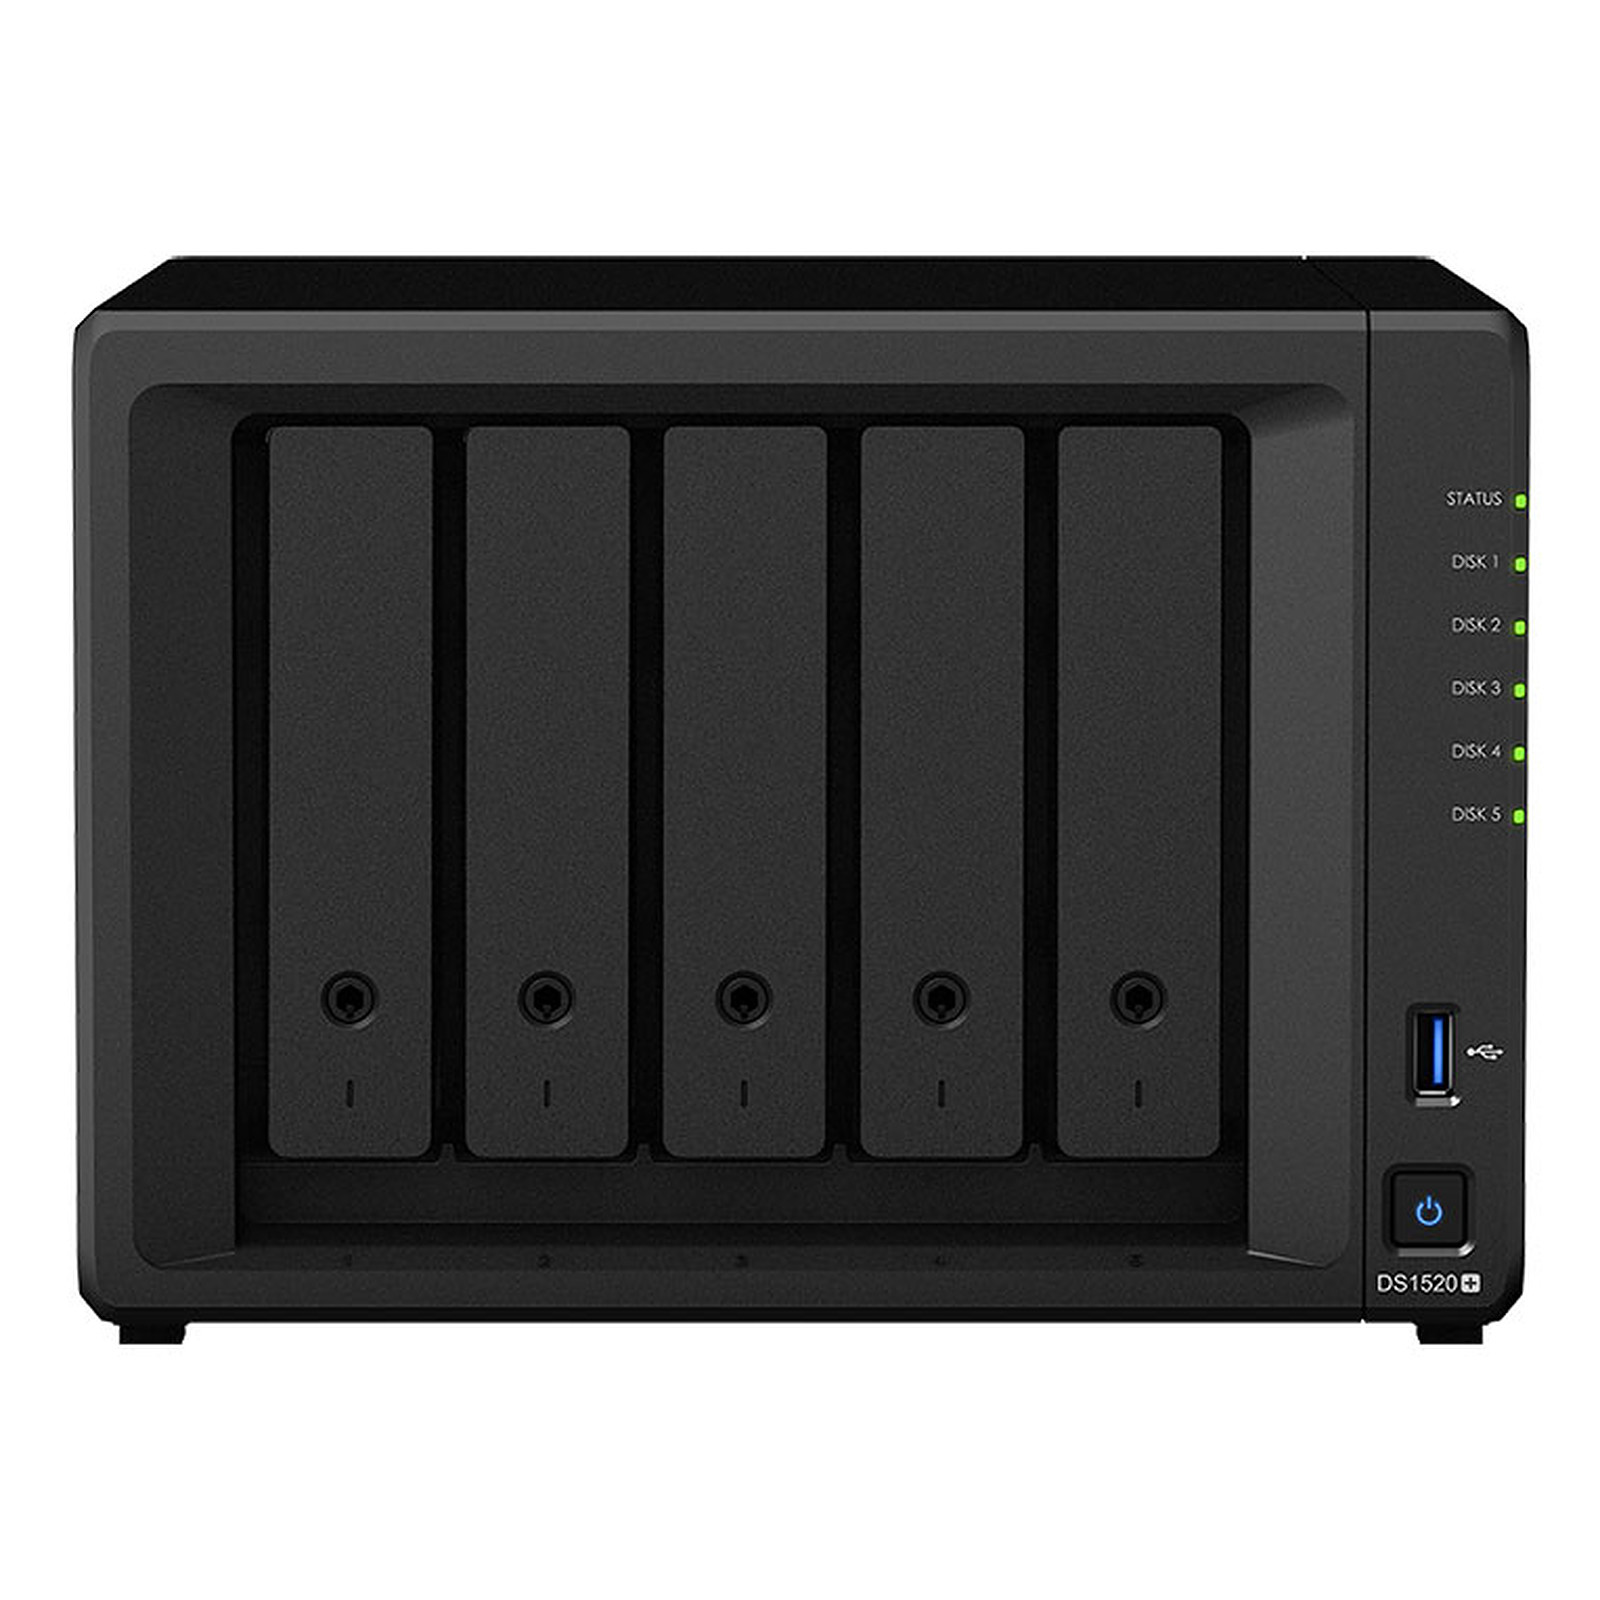 Synology DiskStation DS1520